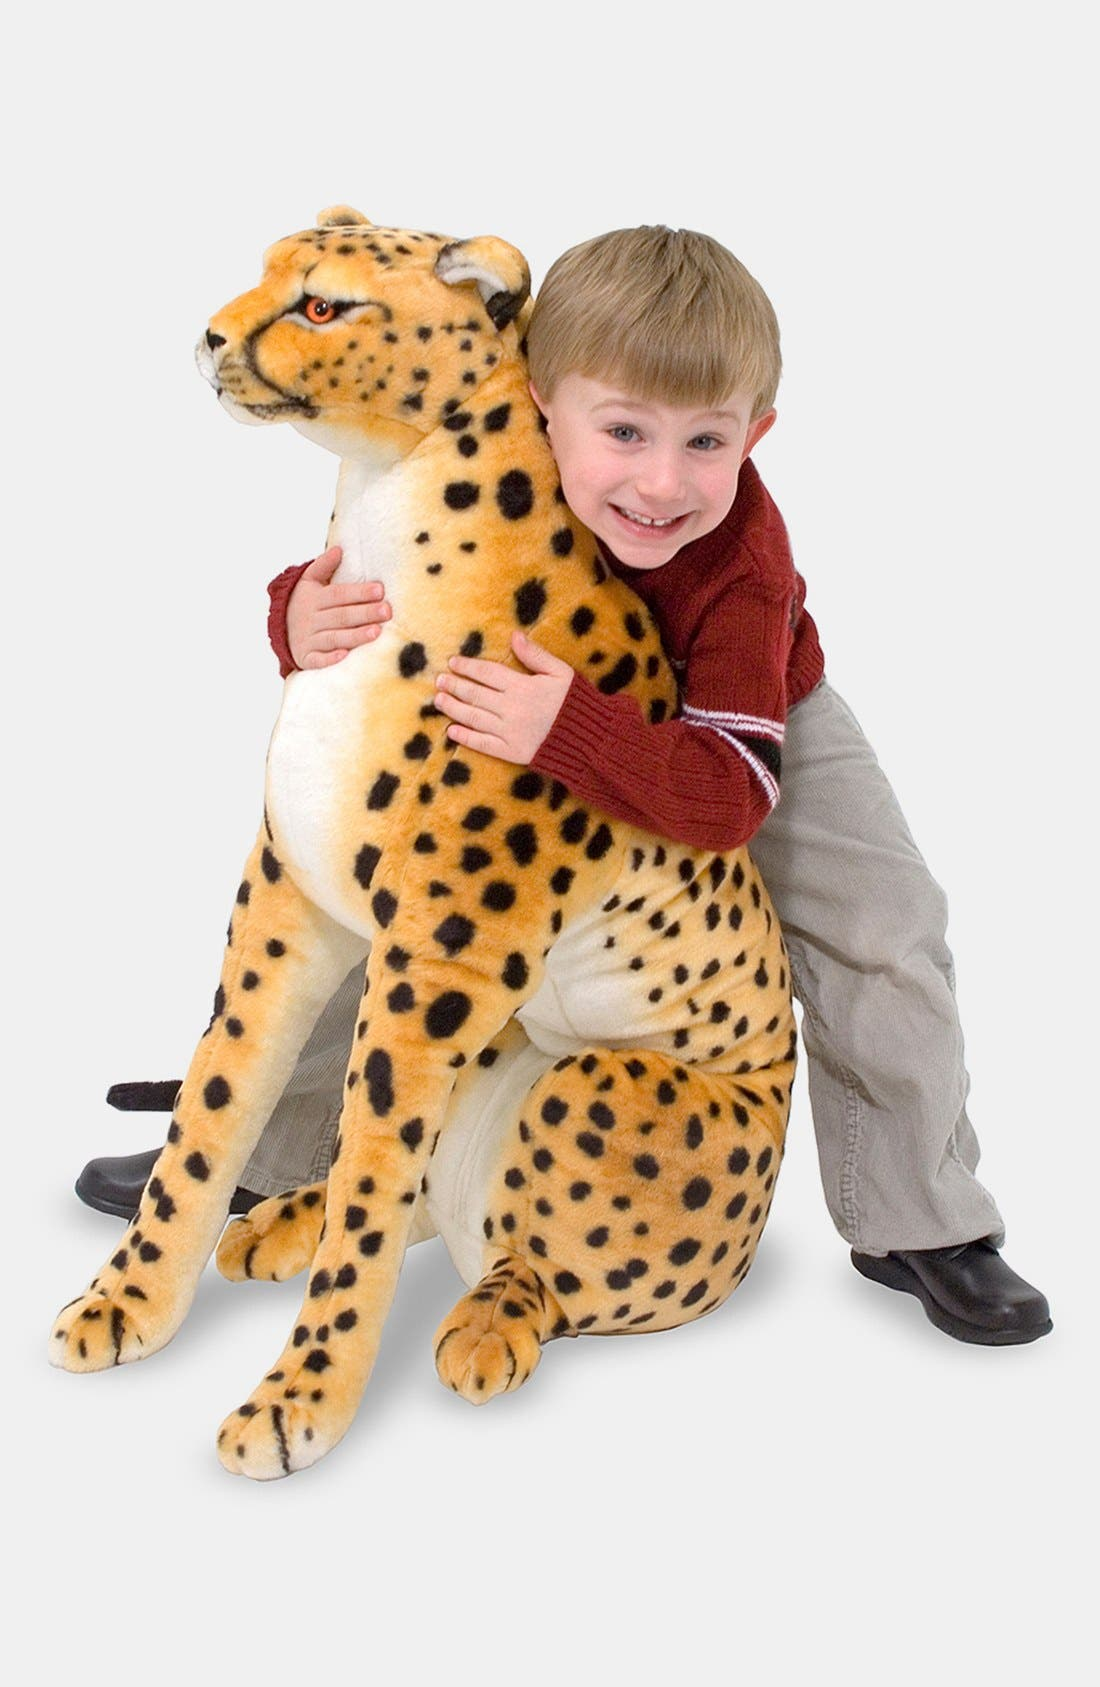 Main Image - Melissa & Doug Plush Cheetah Stuffed Animal